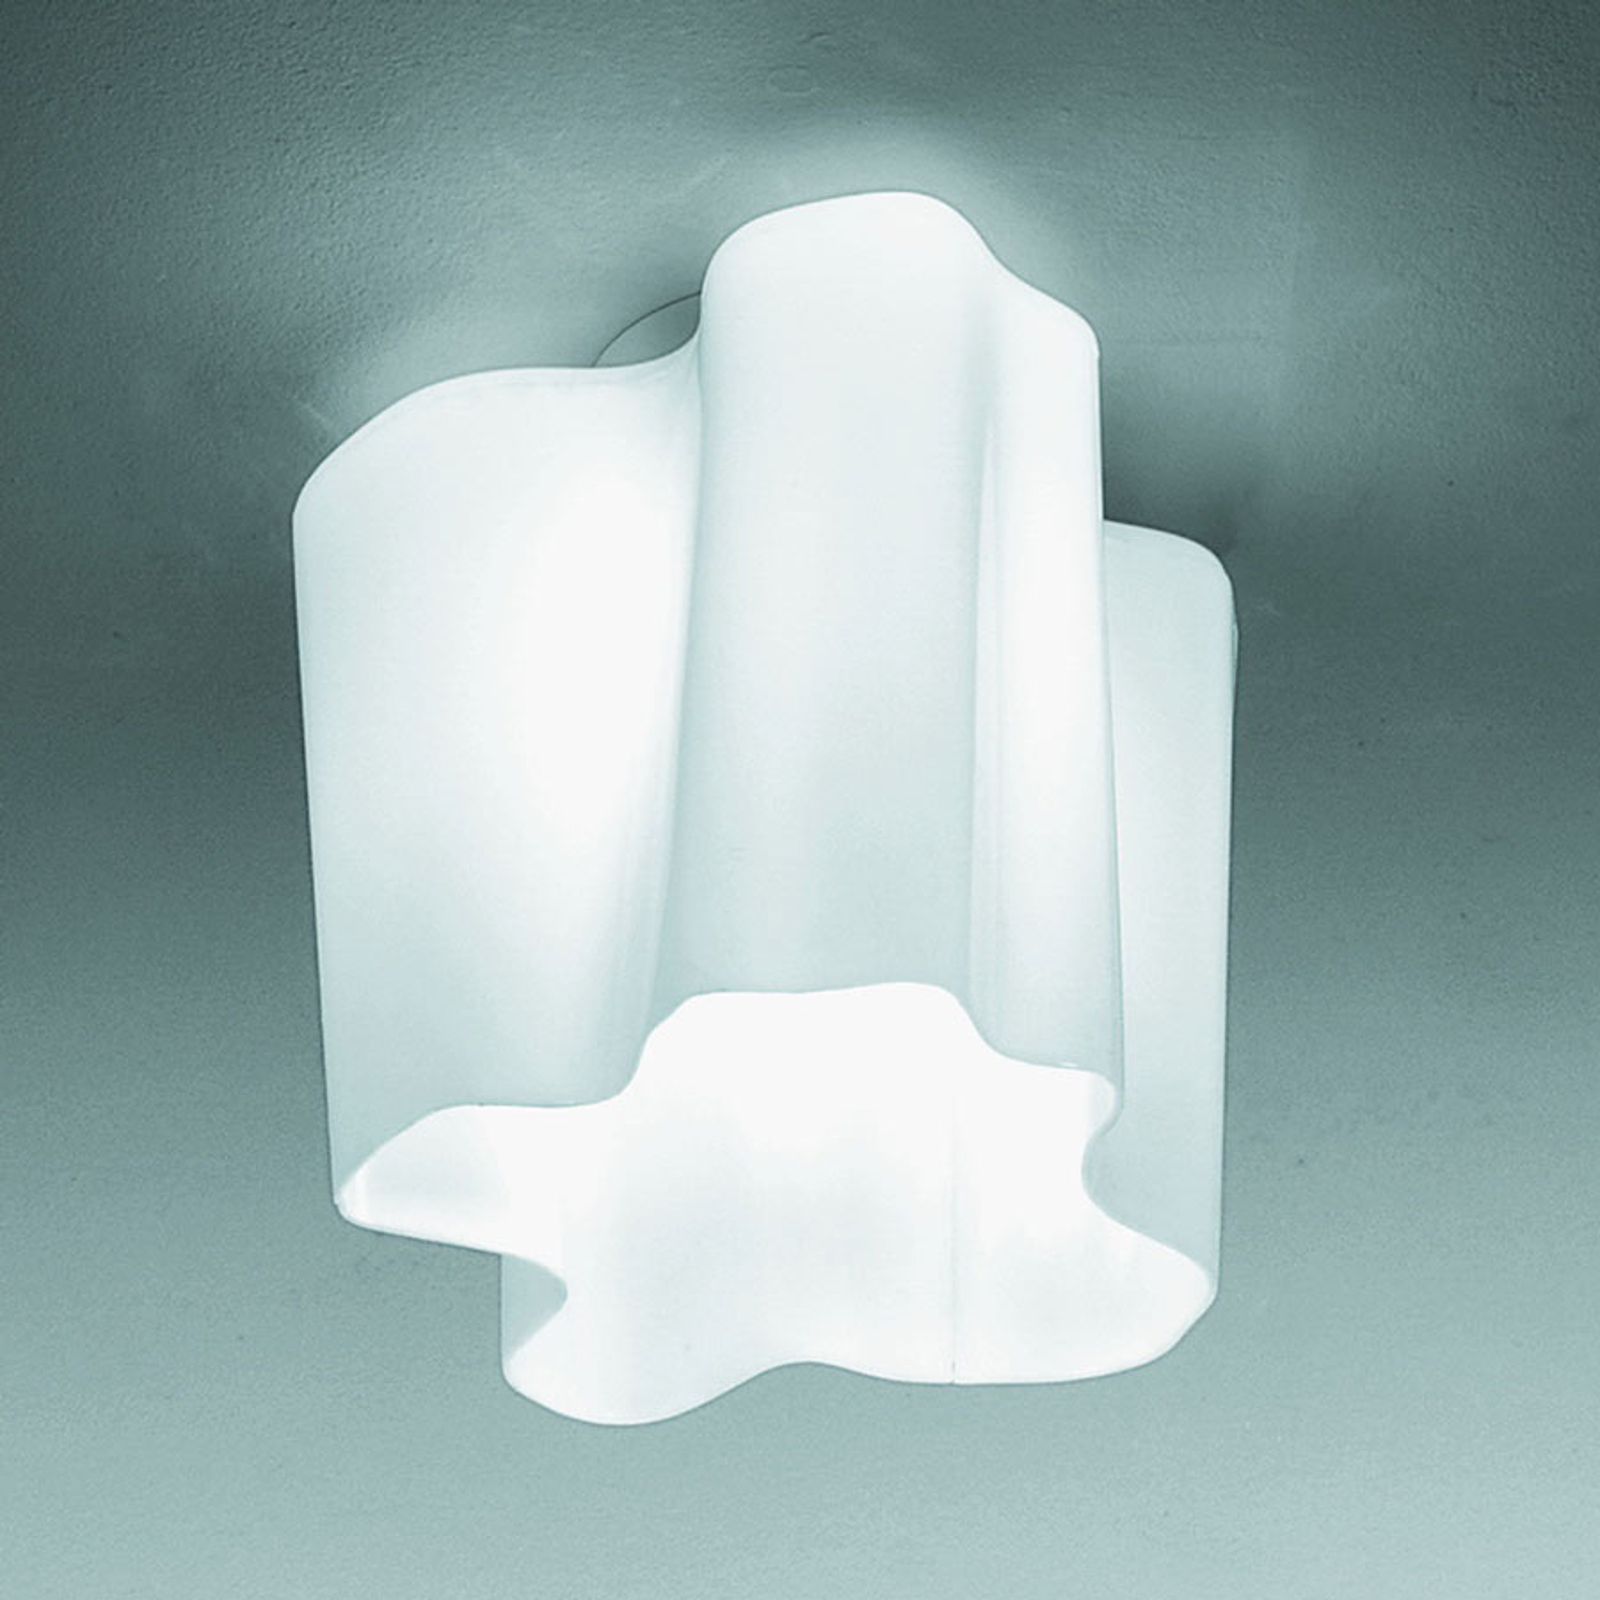 Artemide Logico Micro Deckenlampe 18x18 cm